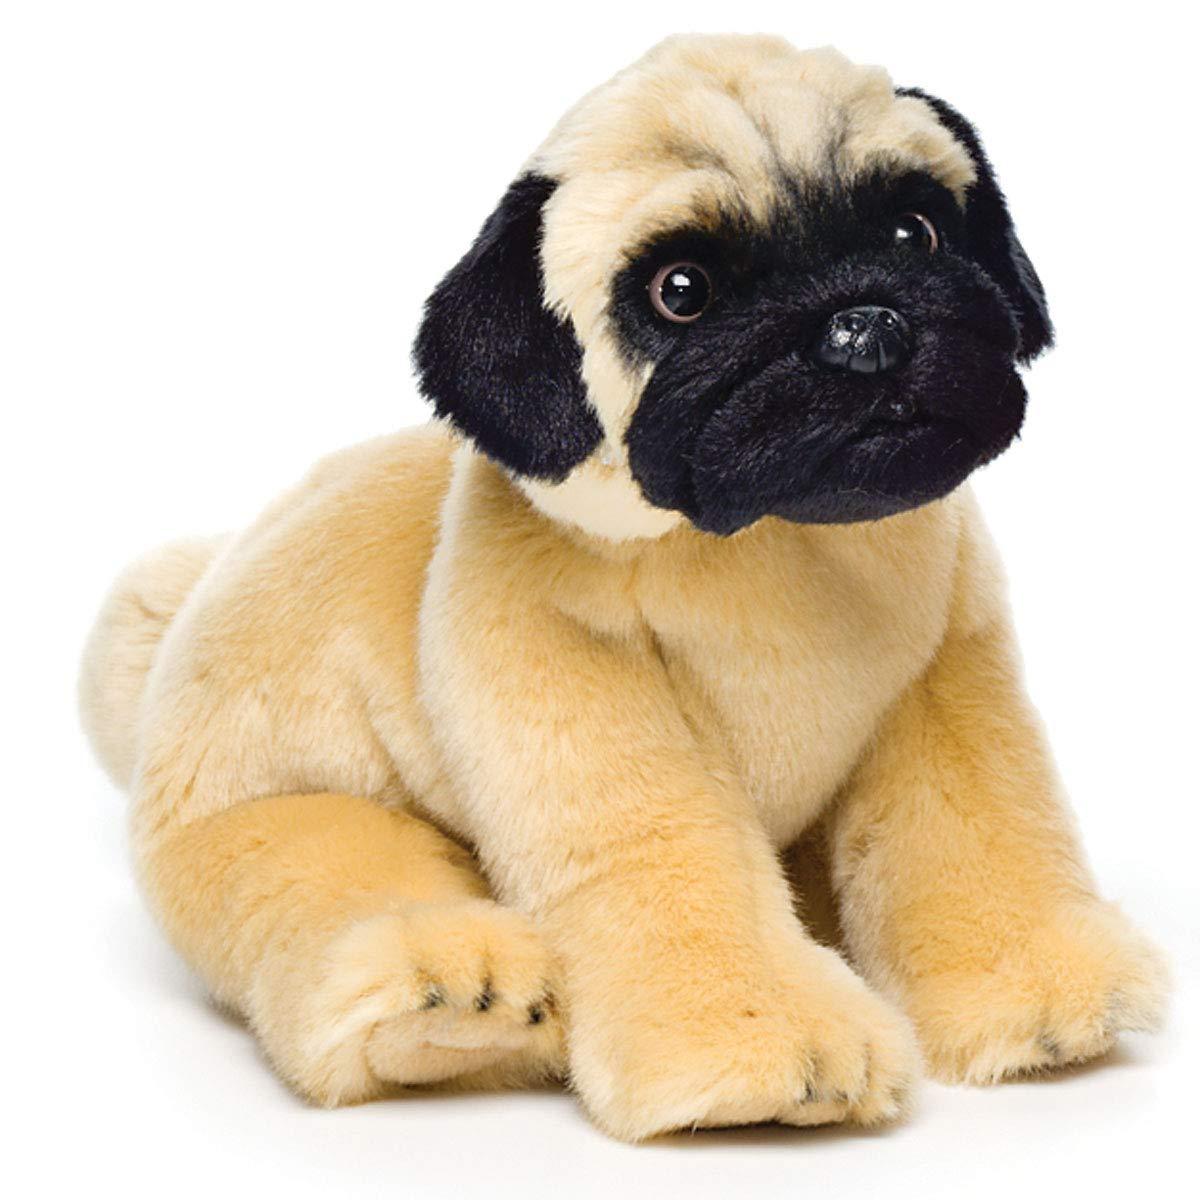 Realistic Pug Stuffed Animal, Amazon Com Nat And Jules Sitting Small Pug Dog Children S Plush Stuffed Animal Toy Baby